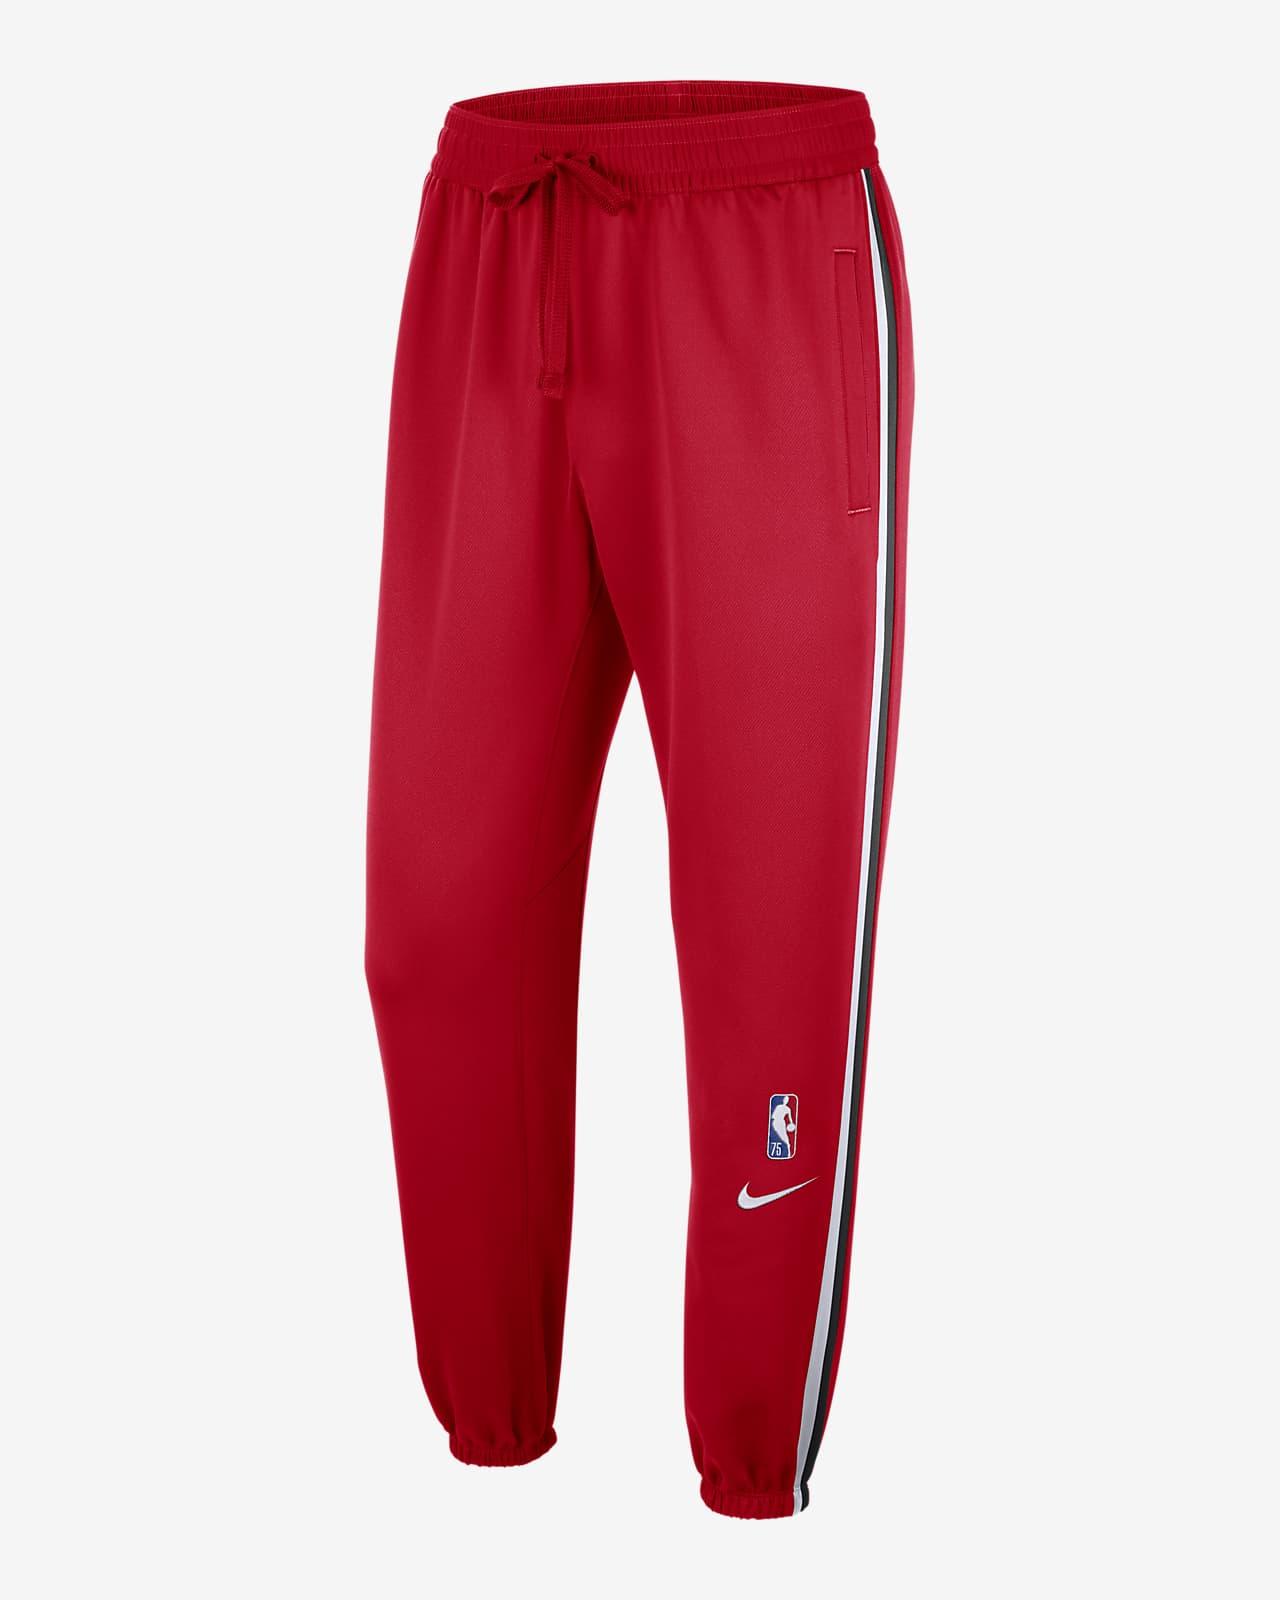 Chicago Bulls Showtime Men's Nike Dri-FIT NBA Trousers